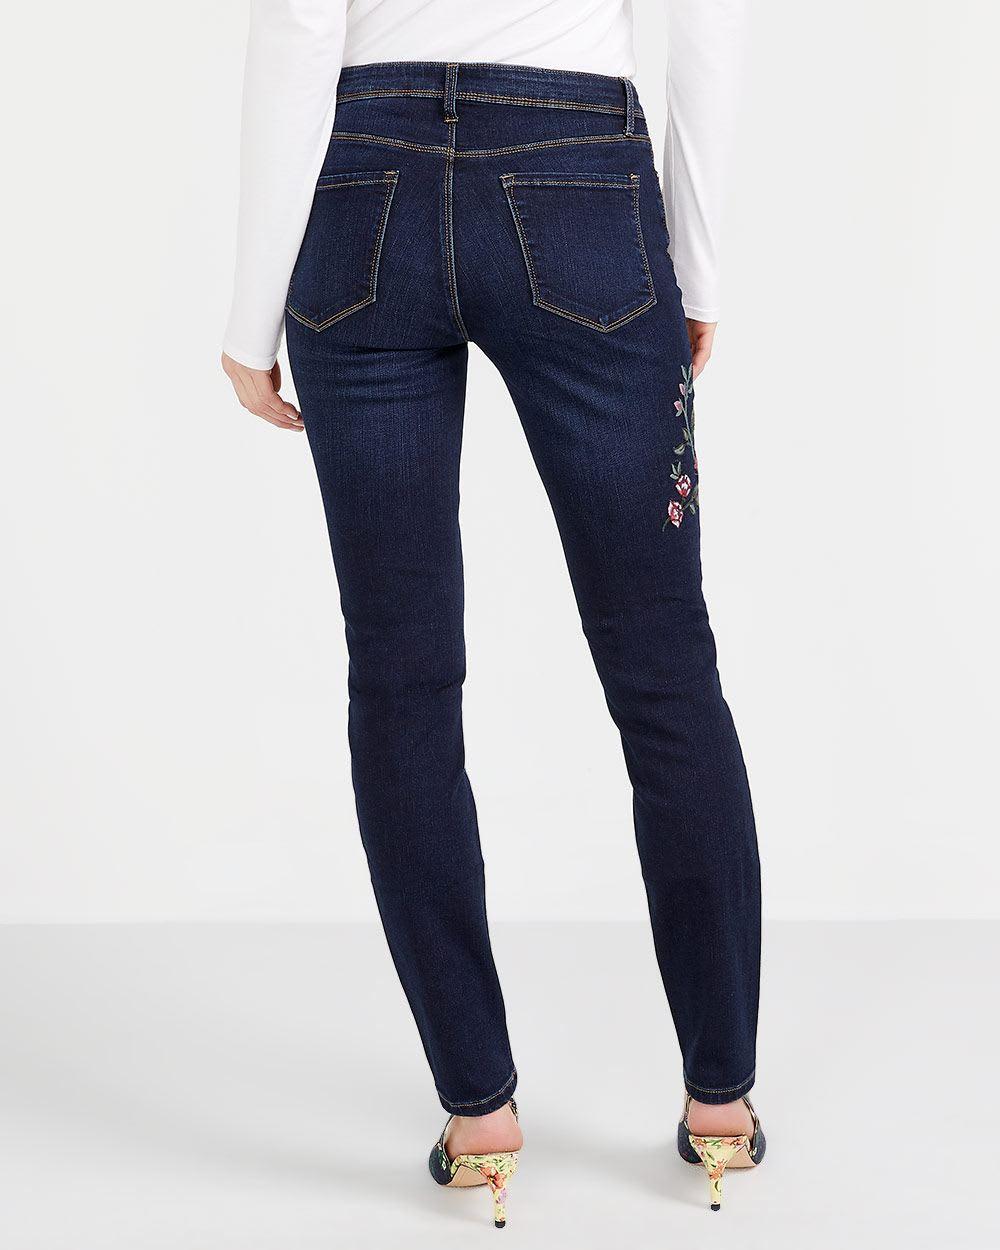 jeans skinny avec broderie petite petites reitmans. Black Bedroom Furniture Sets. Home Design Ideas